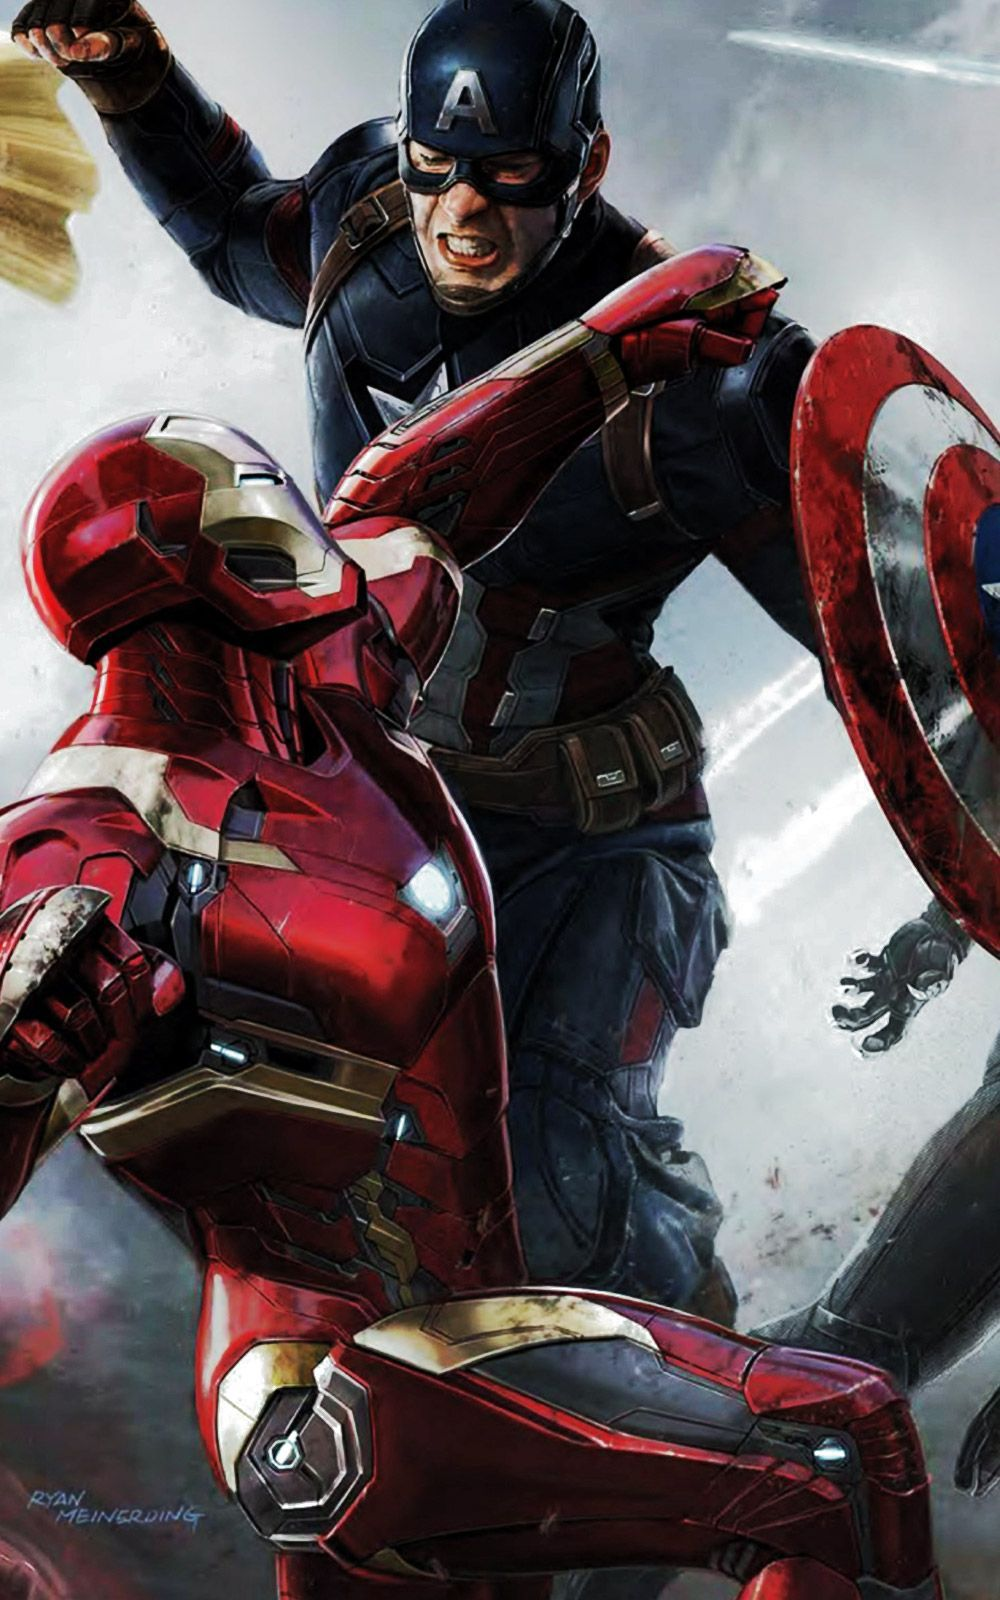 Captain America Vs Iron Man Wallpapers Top Free Captain America